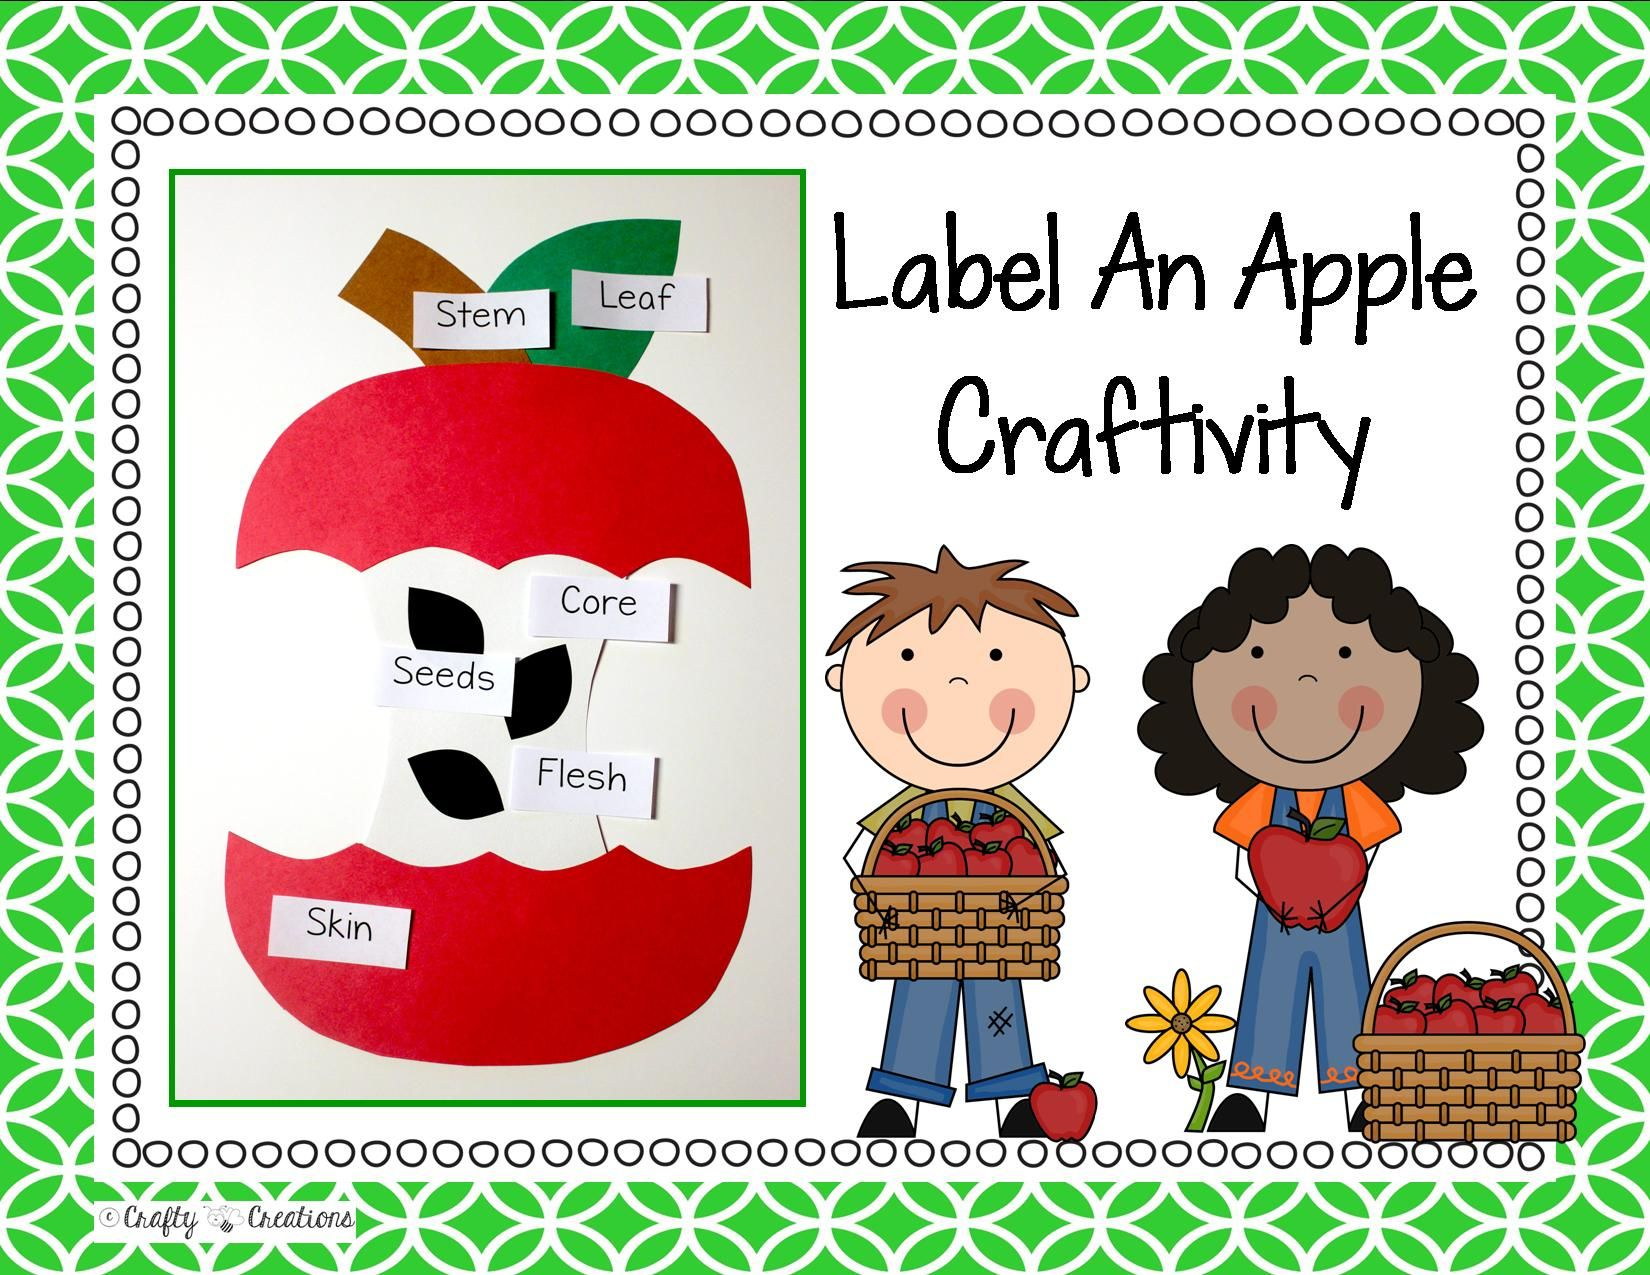 Apple Craft Label An Apple